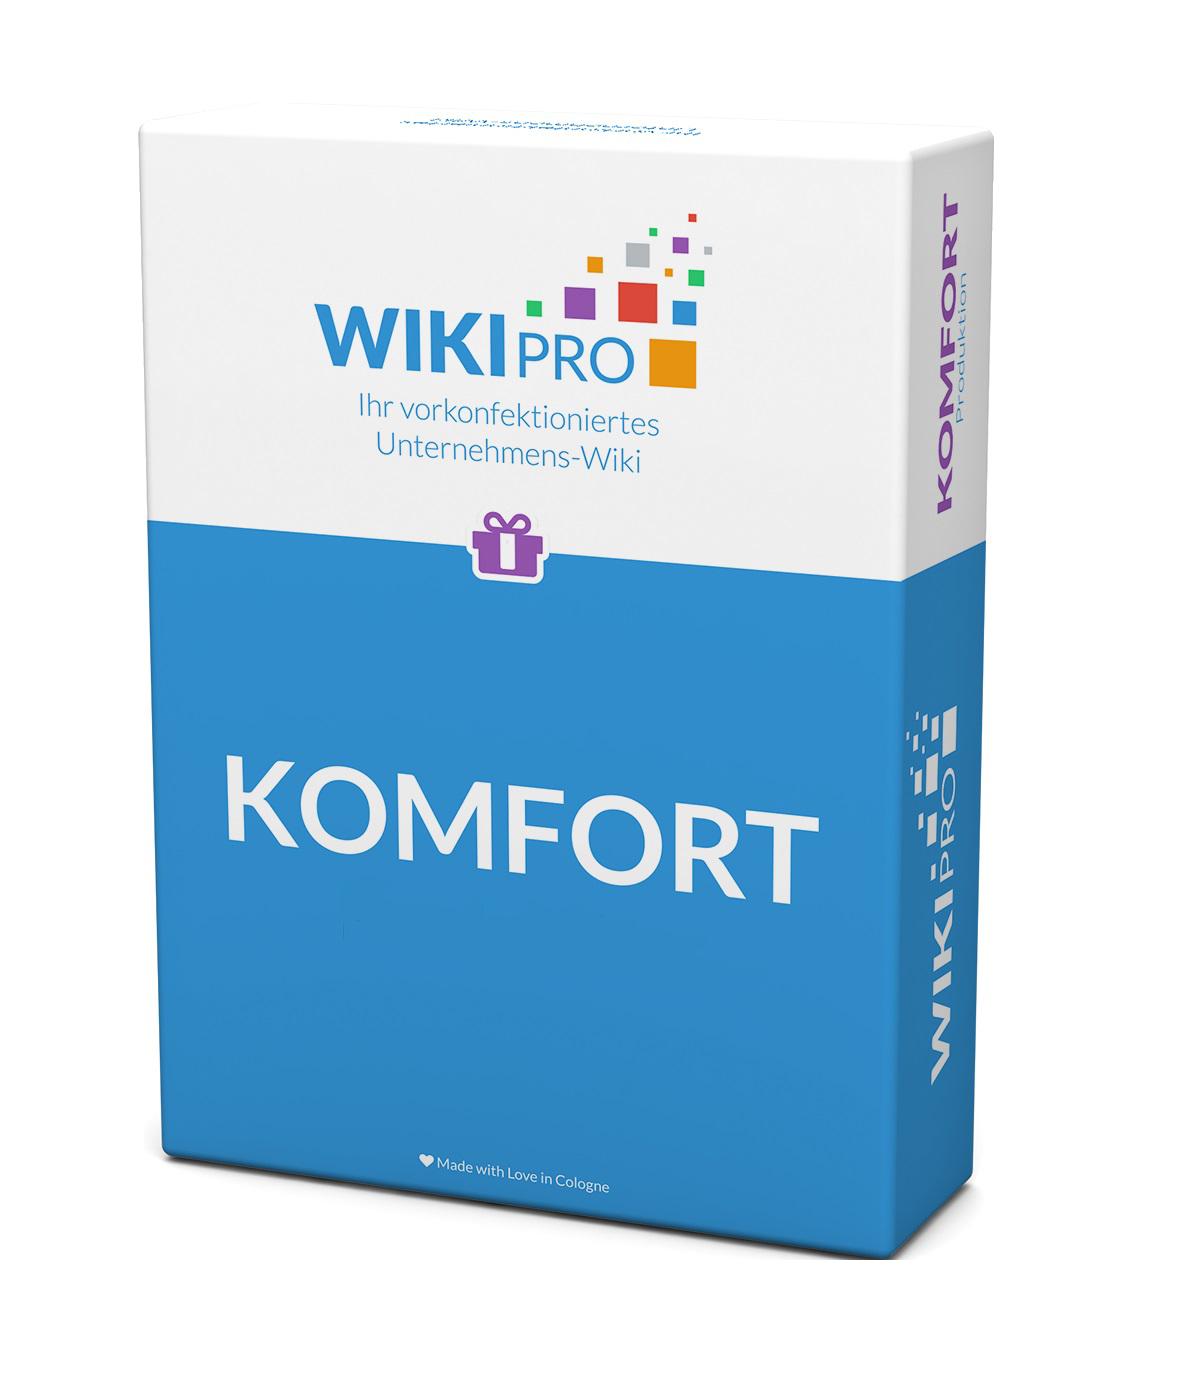 WIKIpro Komfort